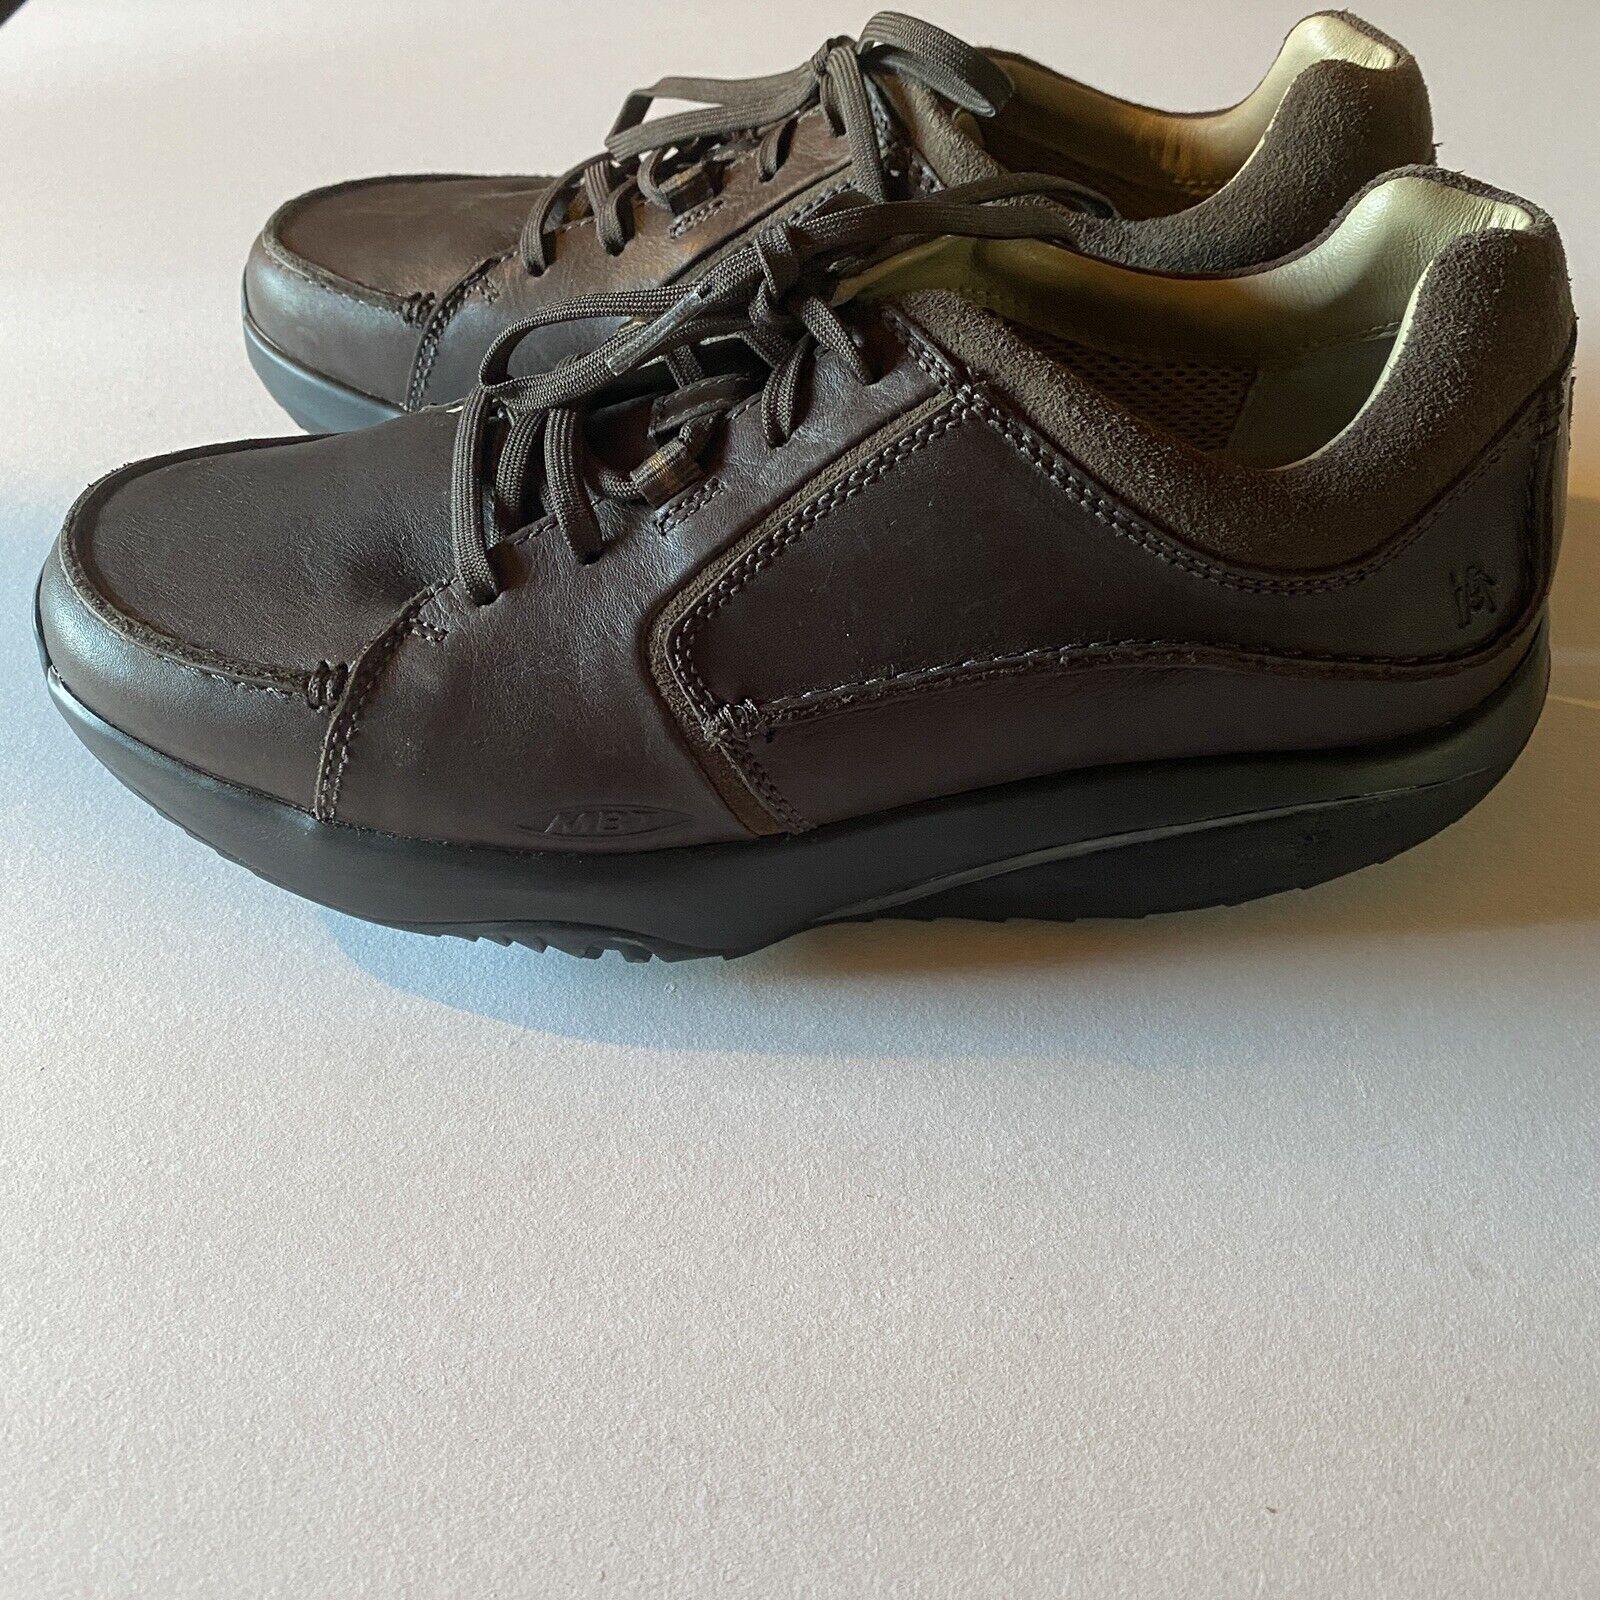 MBT Fanaka Rocker Walking Shoes 400223-01 Men's 8.5 (EUR 41) Brown Leather